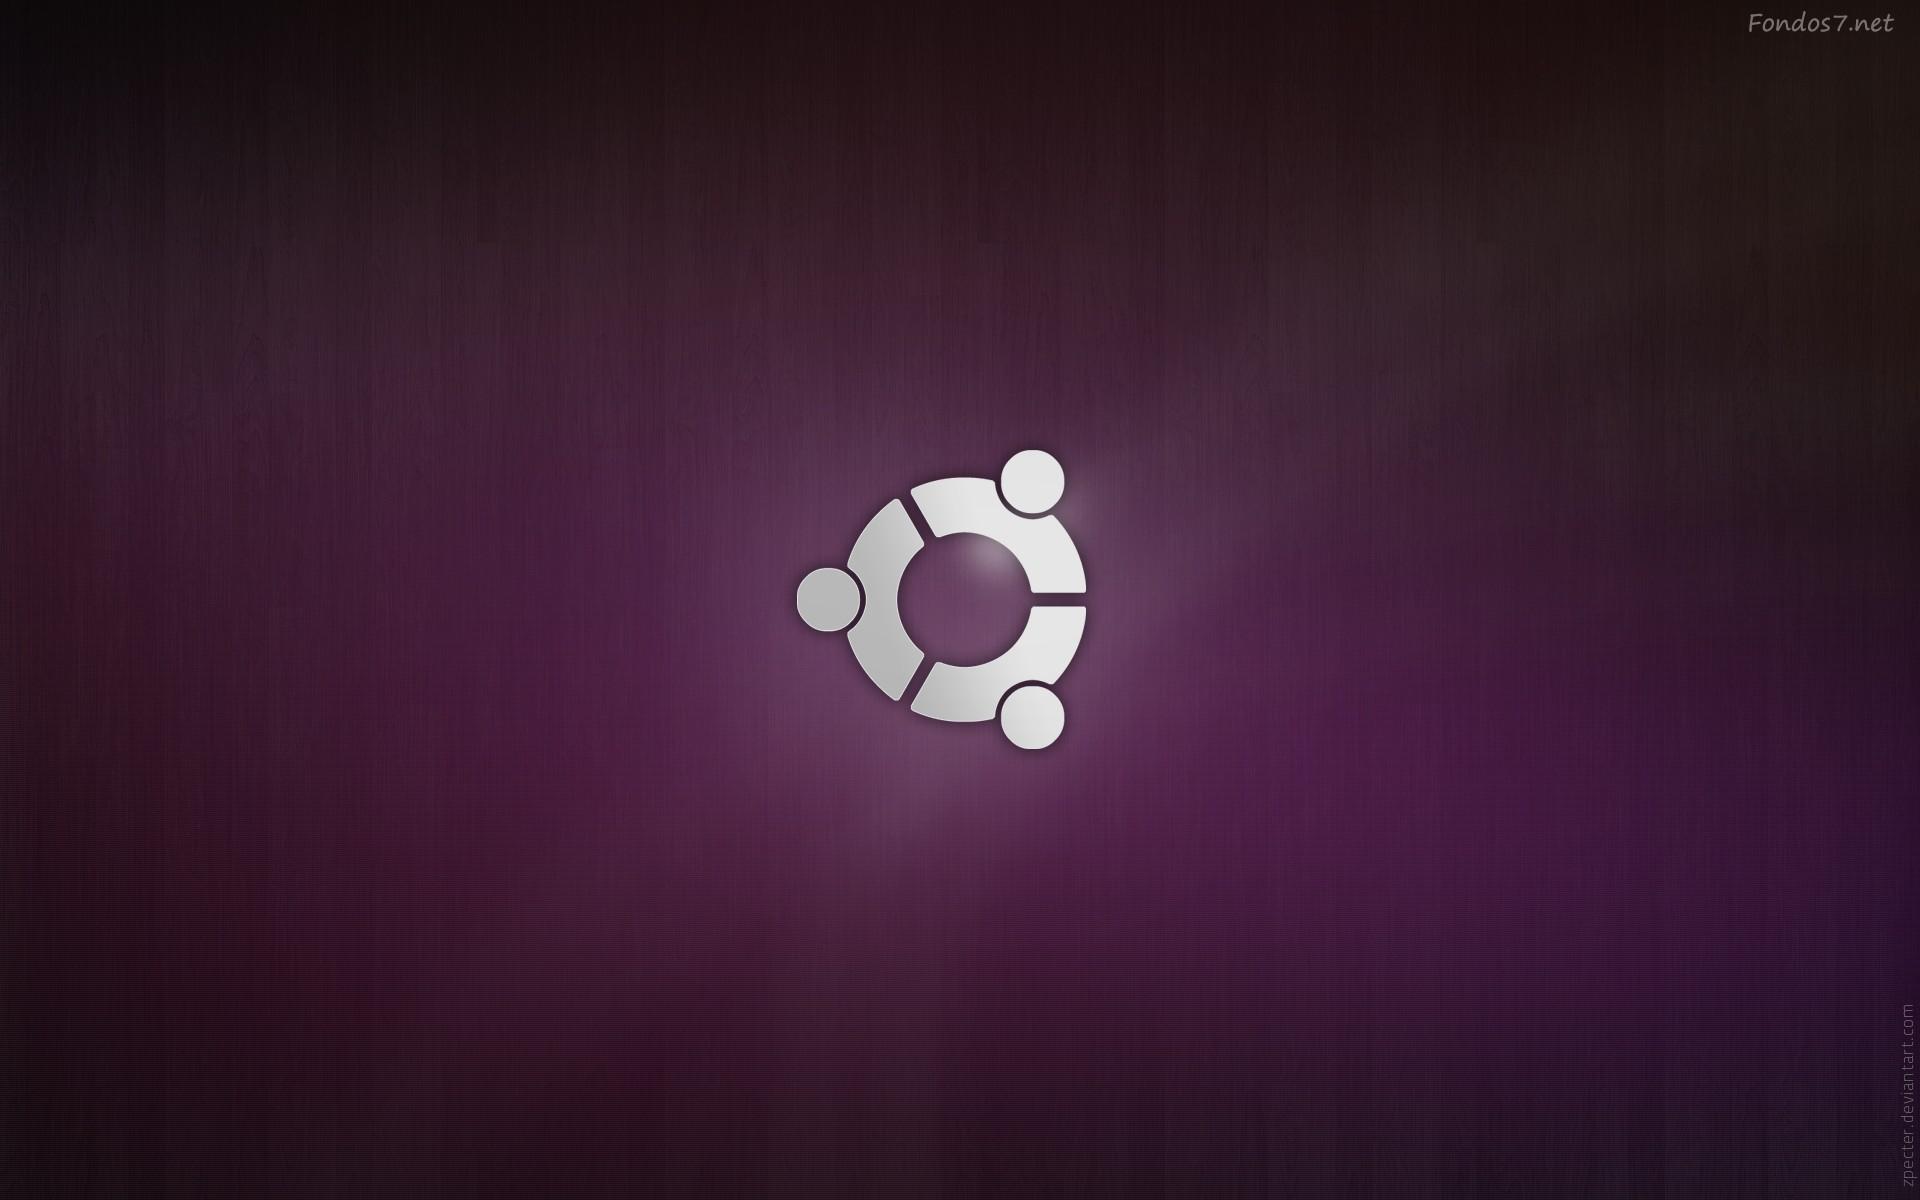 Wallpapers Ubuntu Linux Wallpapers: Kali Linux Wallpaper HD (69+ Images